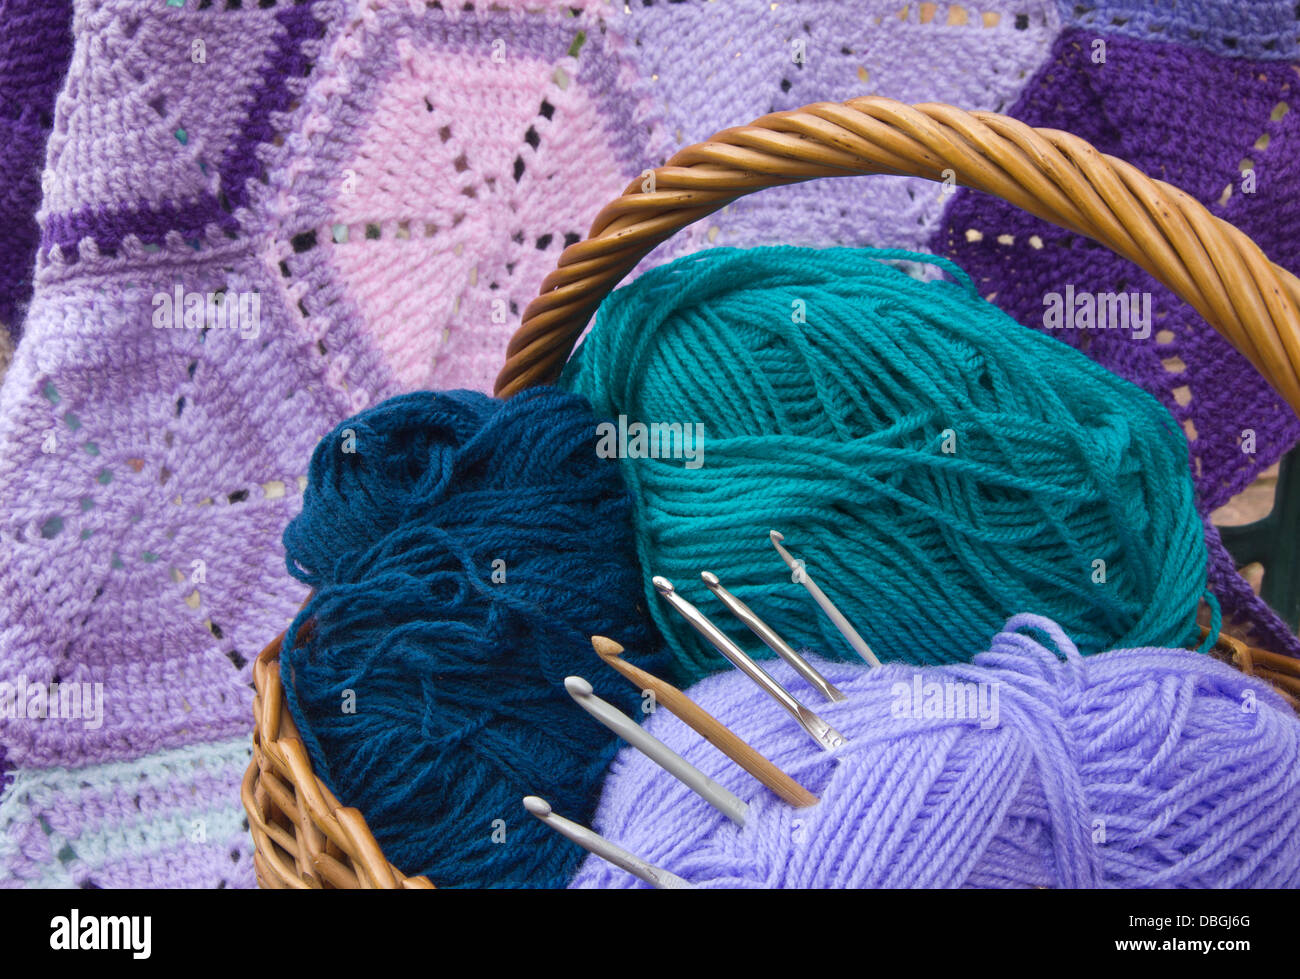 Crochet Work Hexagon blanket, Wools, Basket and Crochet Hooks - Stock Image